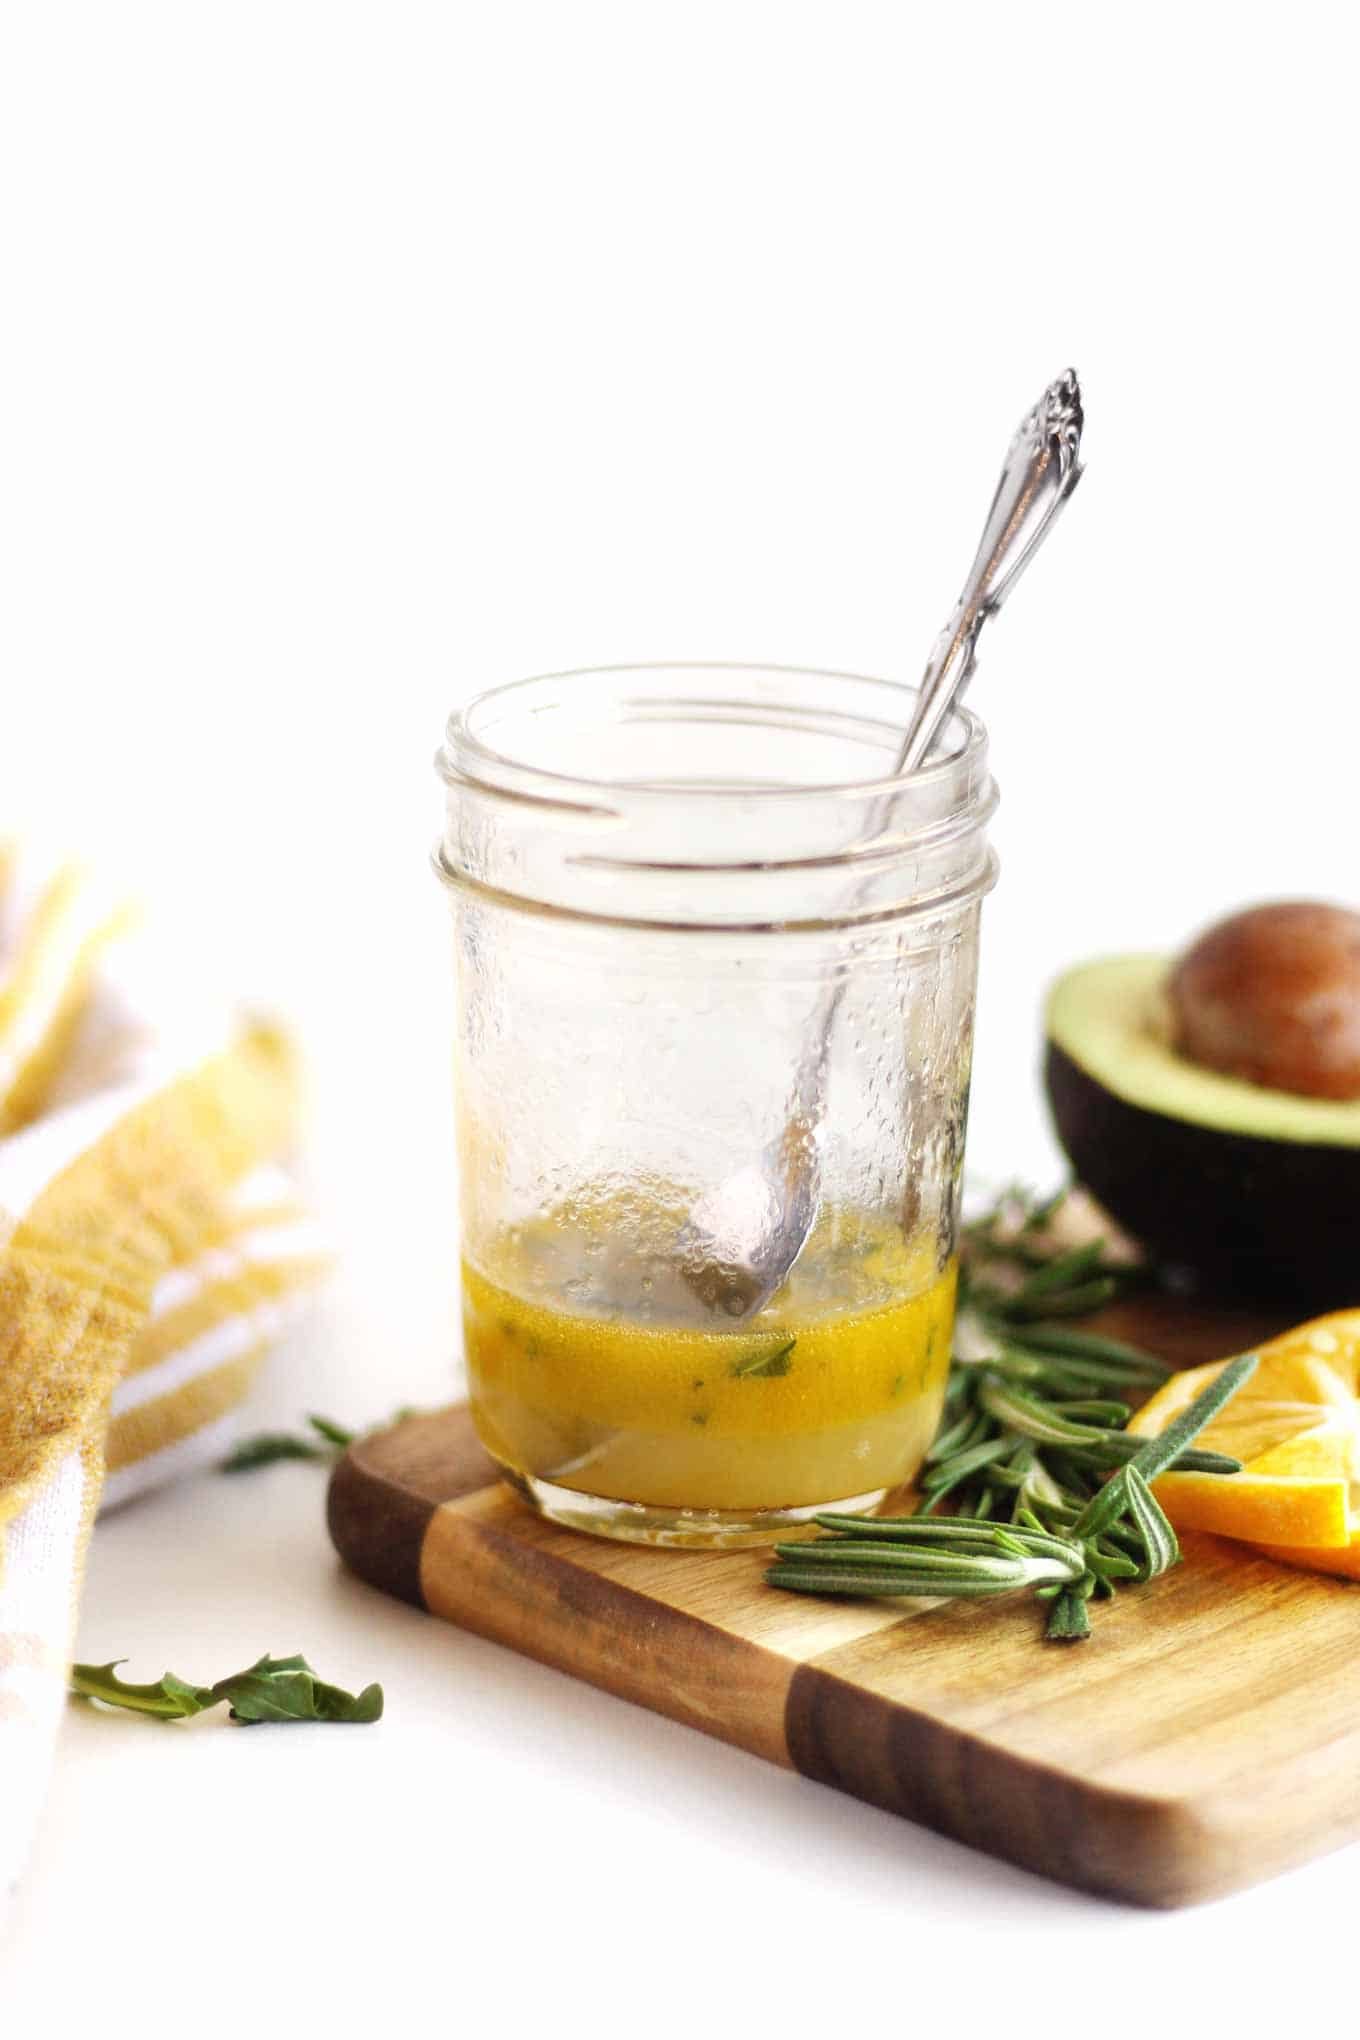 meyer lemon salad dressing